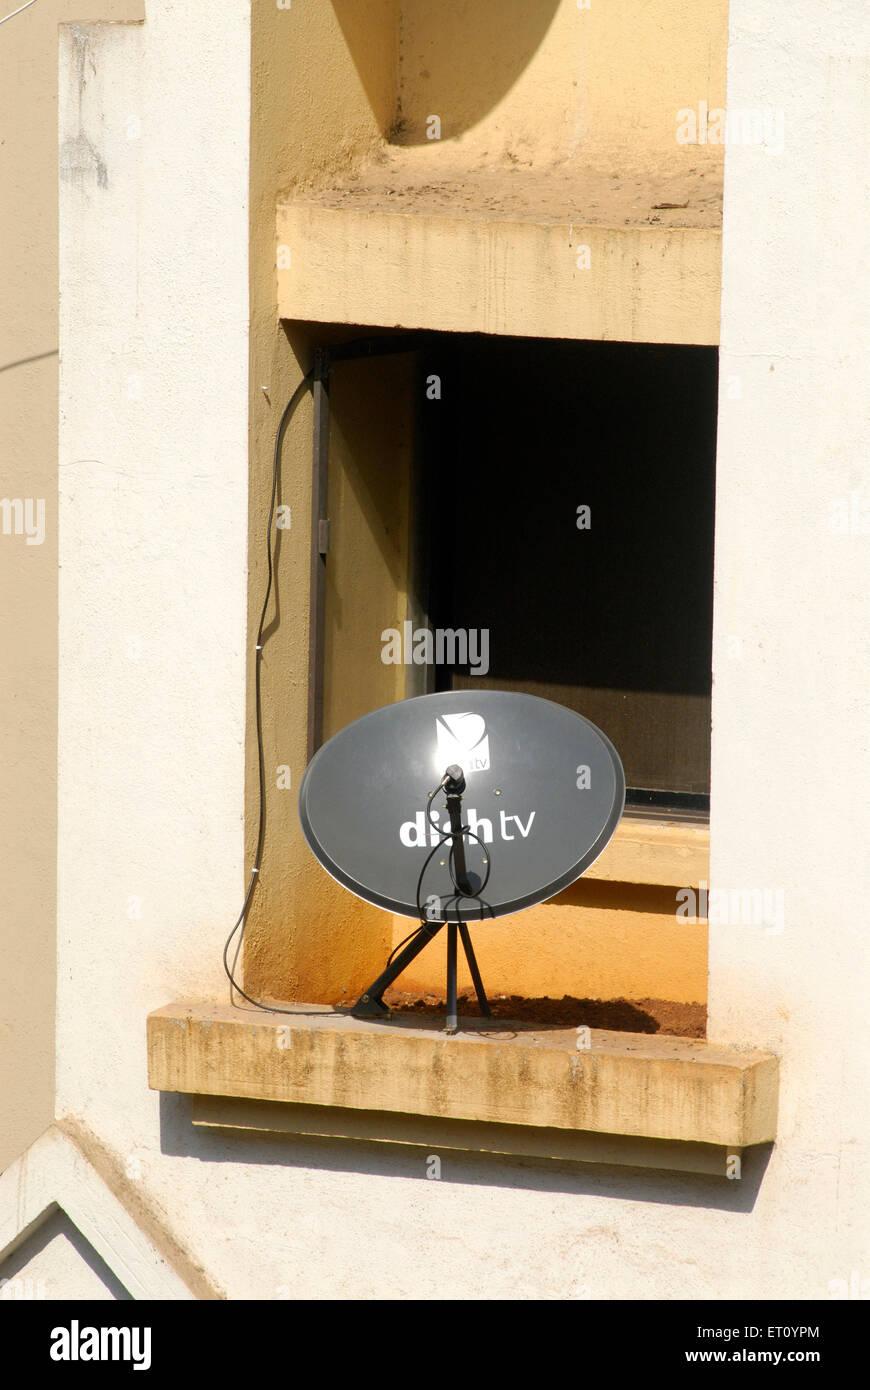 Black dish antenna for television direct to home DTH service via satellite  ; Borivali  ;  Bombay Mumbai - Stock Image